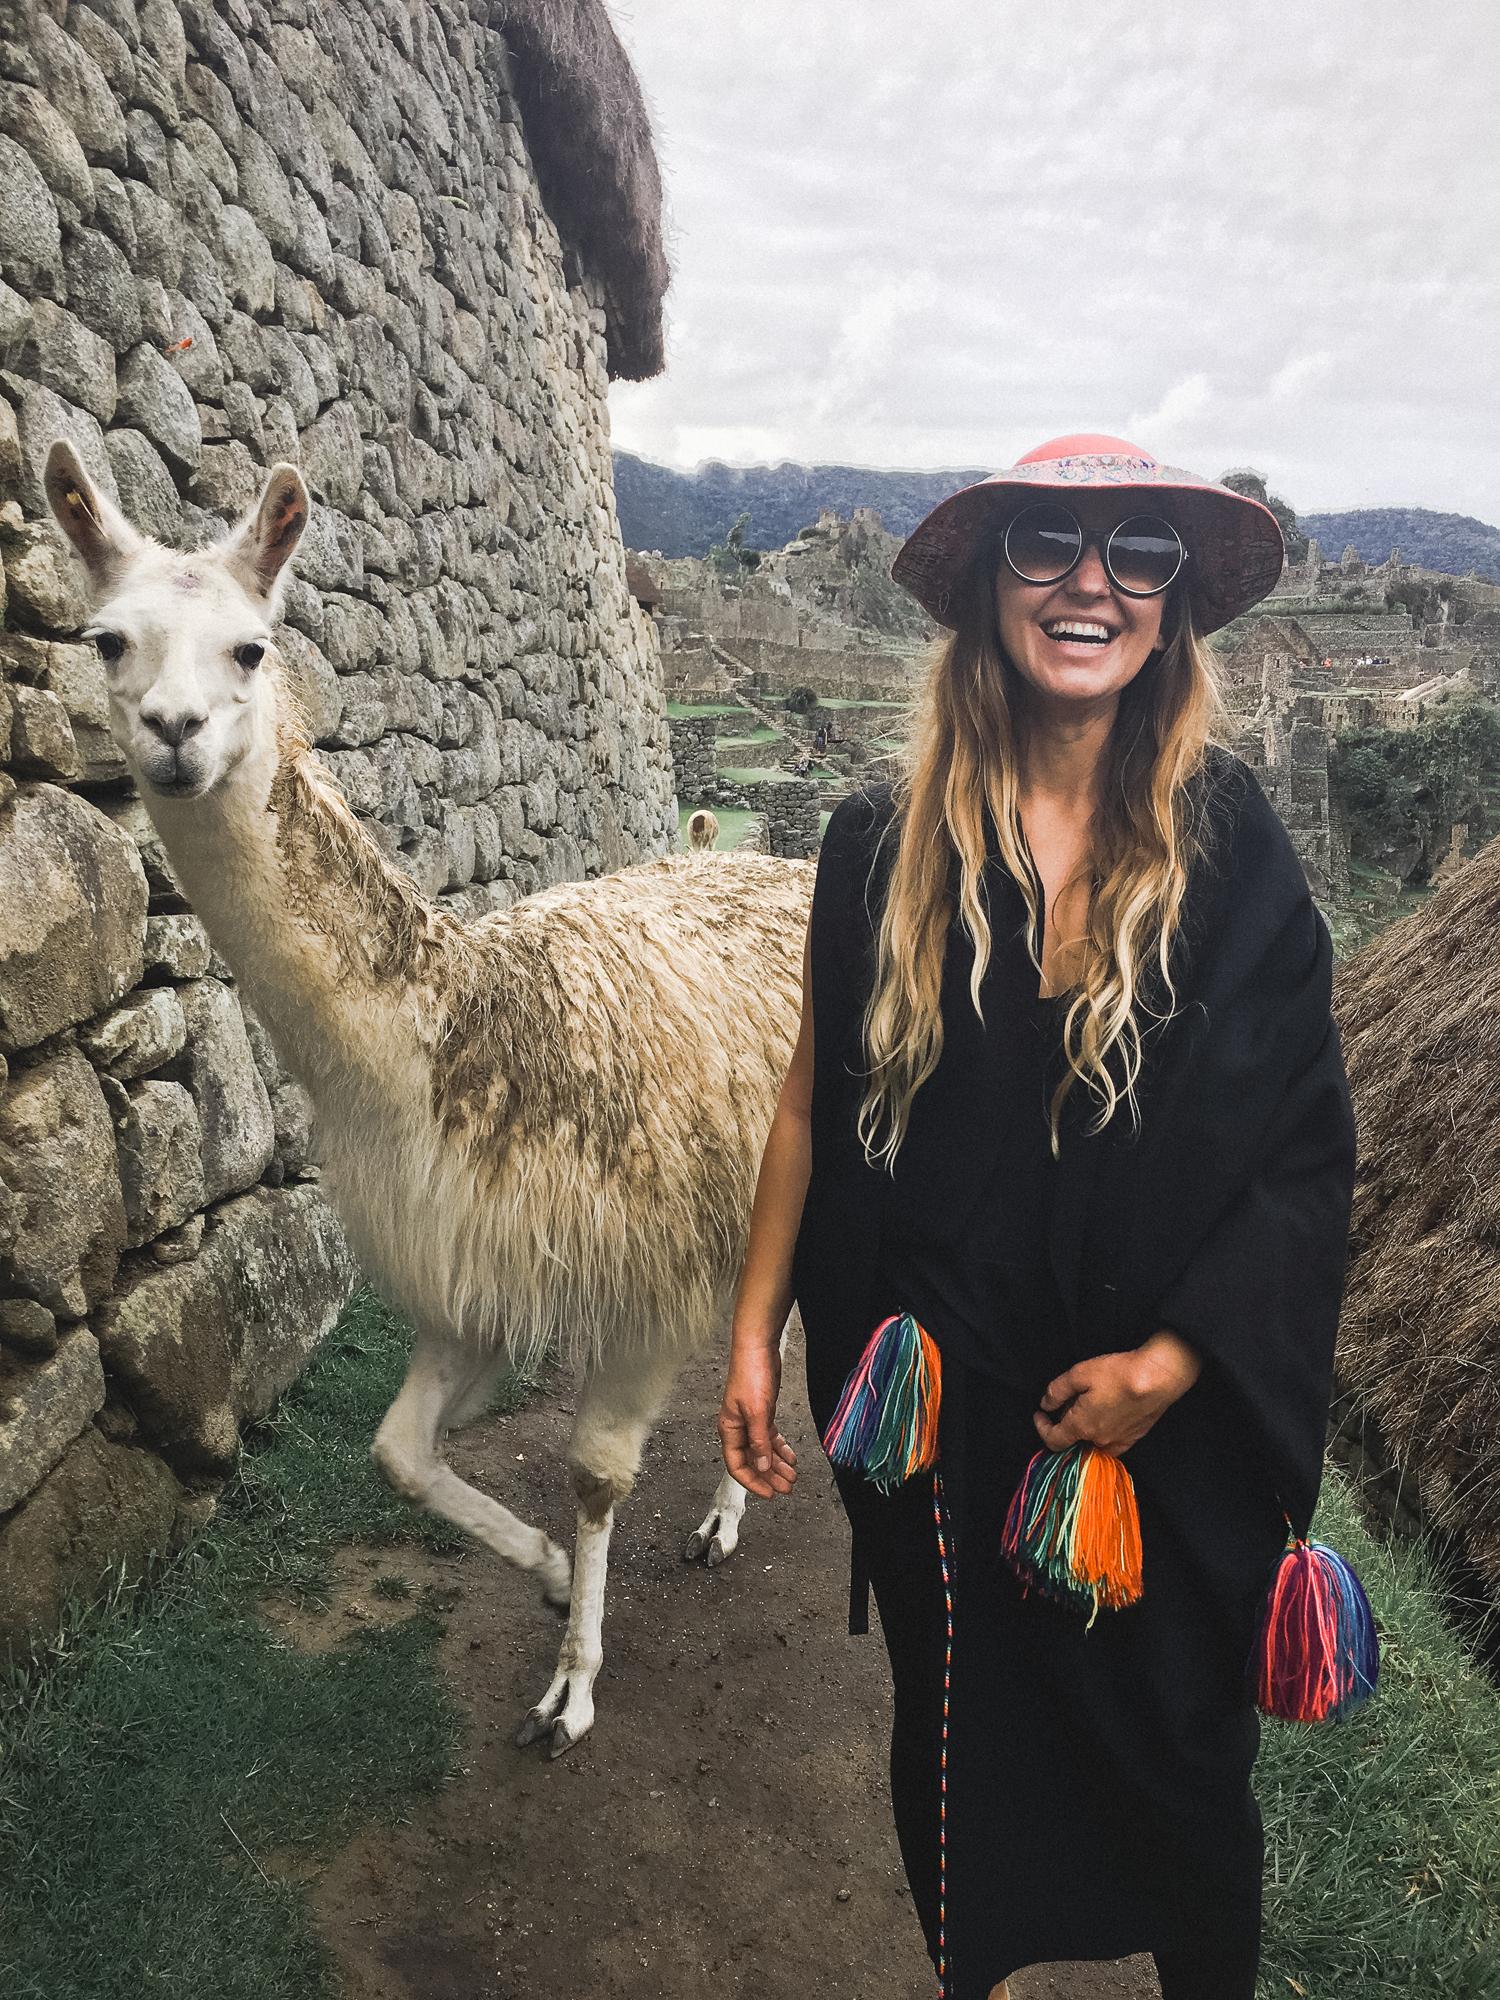 Llamas picture at Machu Picchu